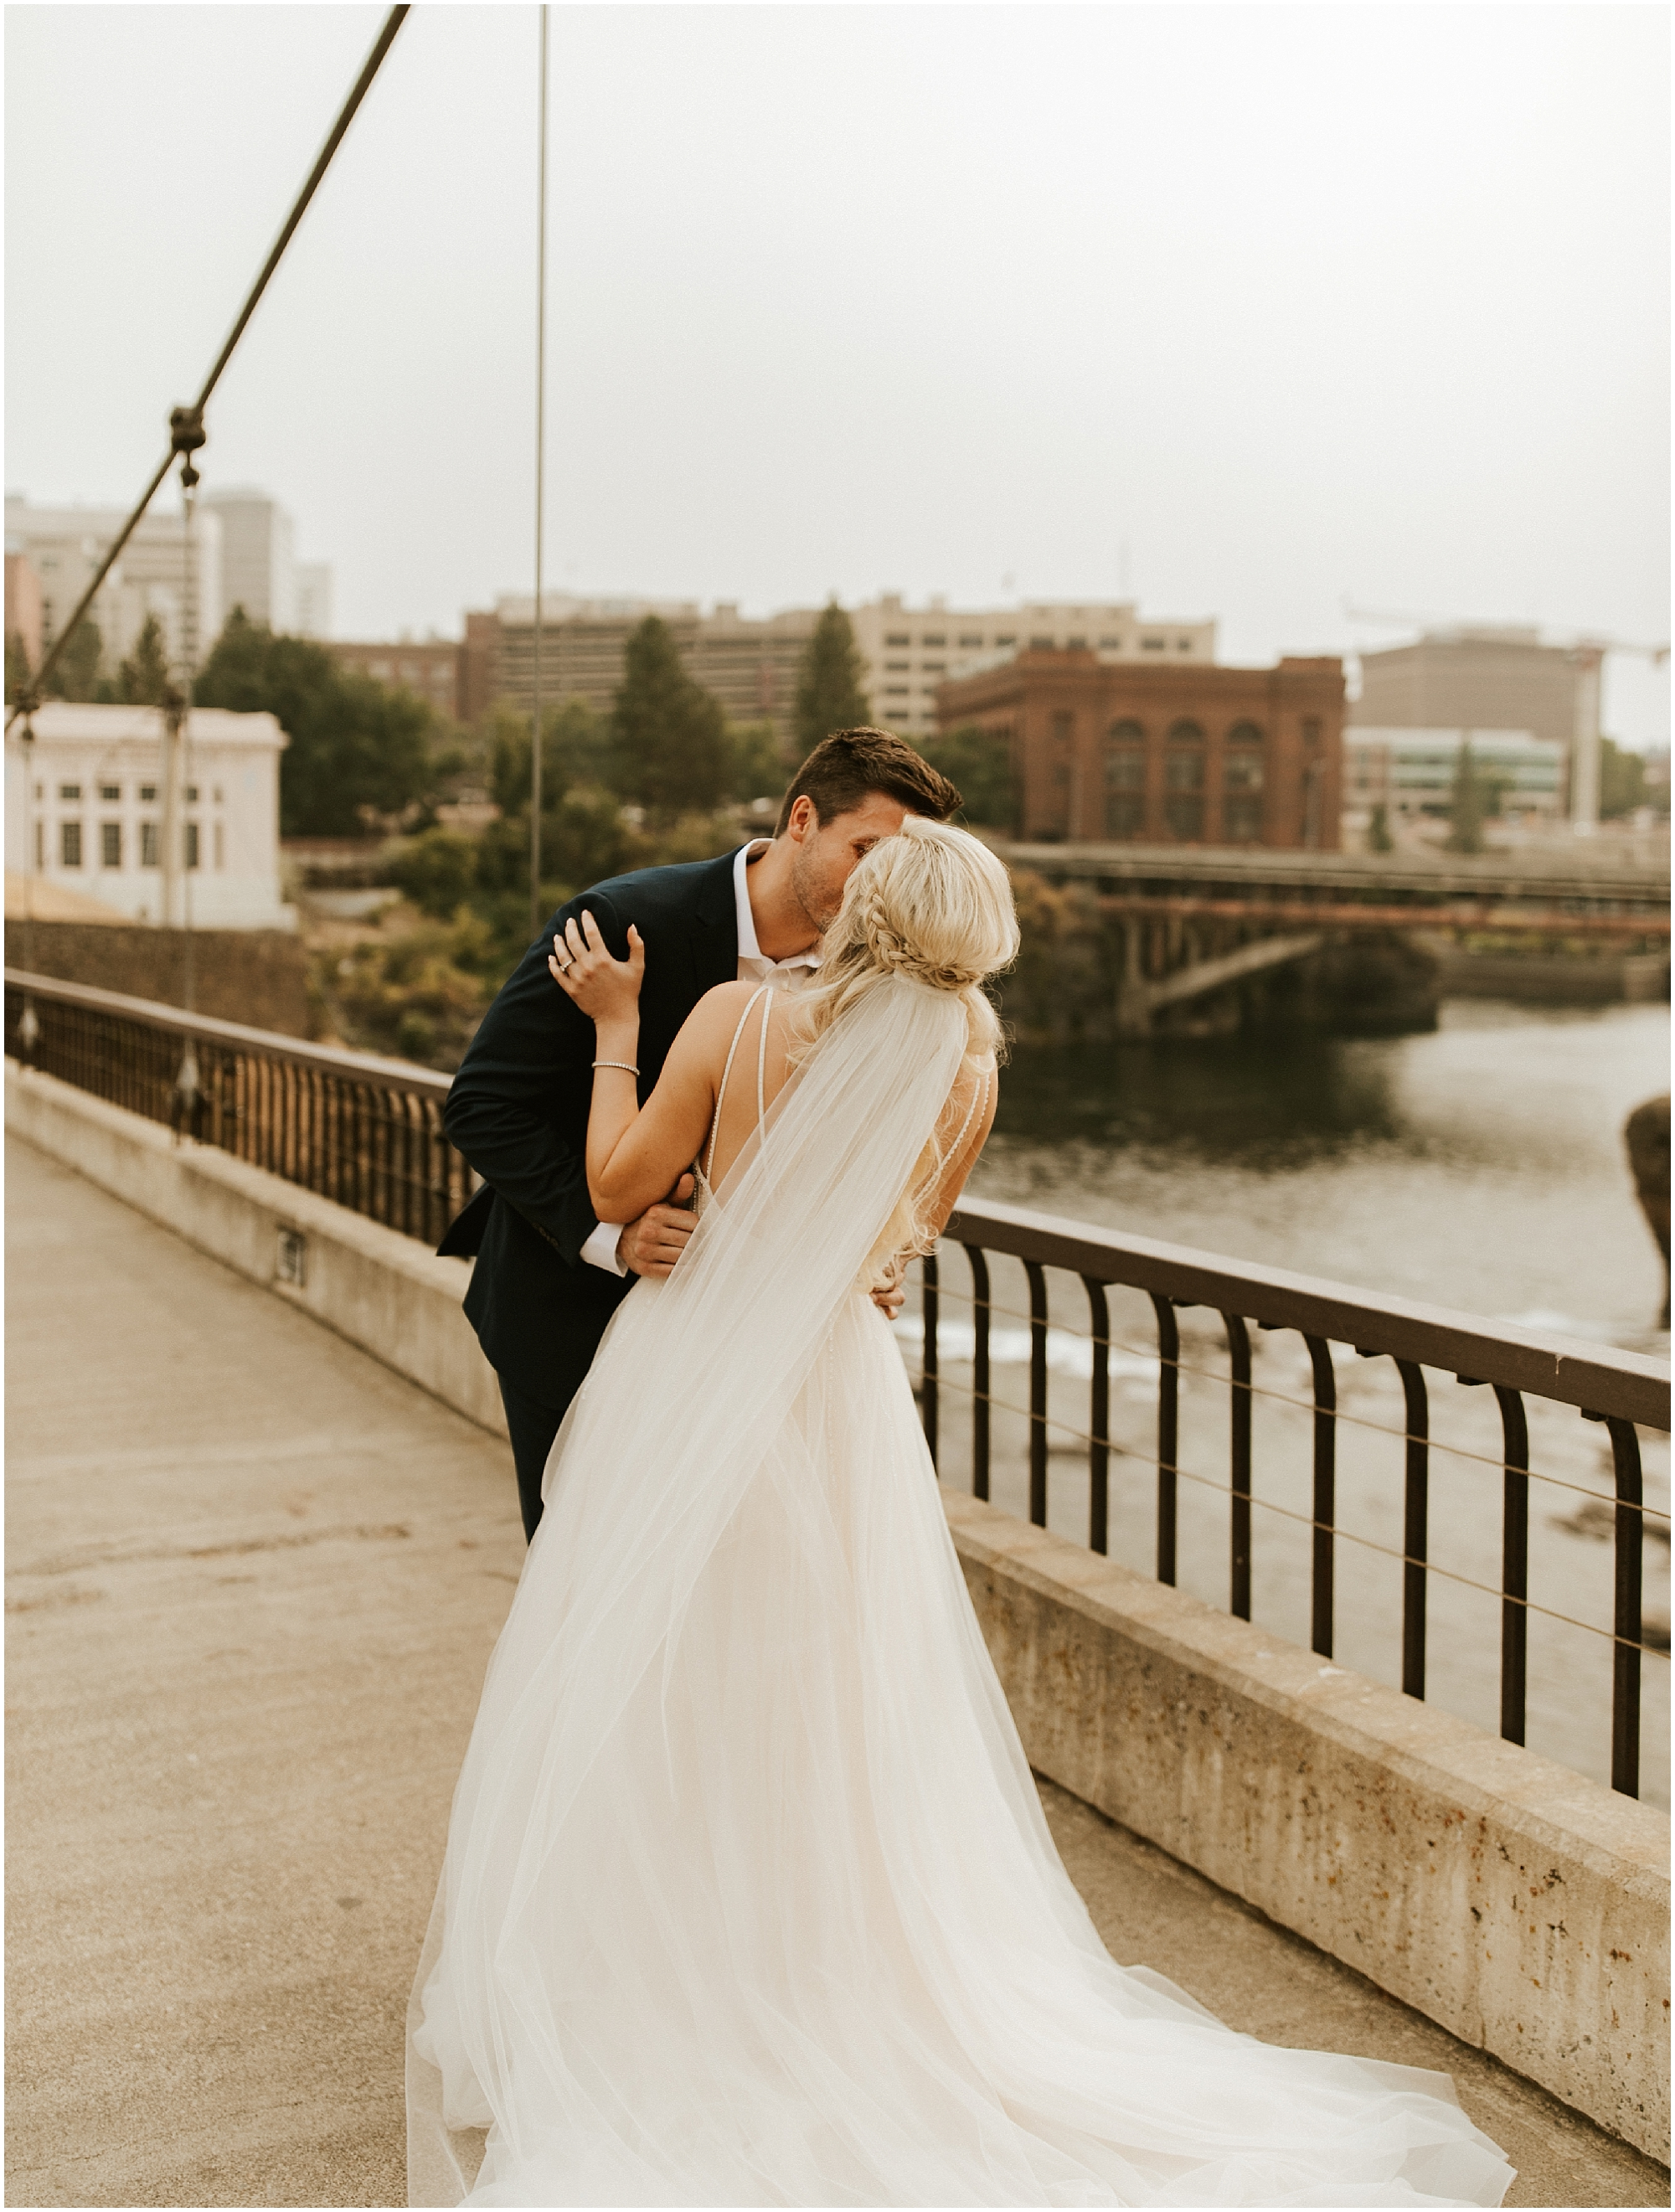 Chateau Rive Spokane Wedding Cassie Trottier Photography1026.jpg